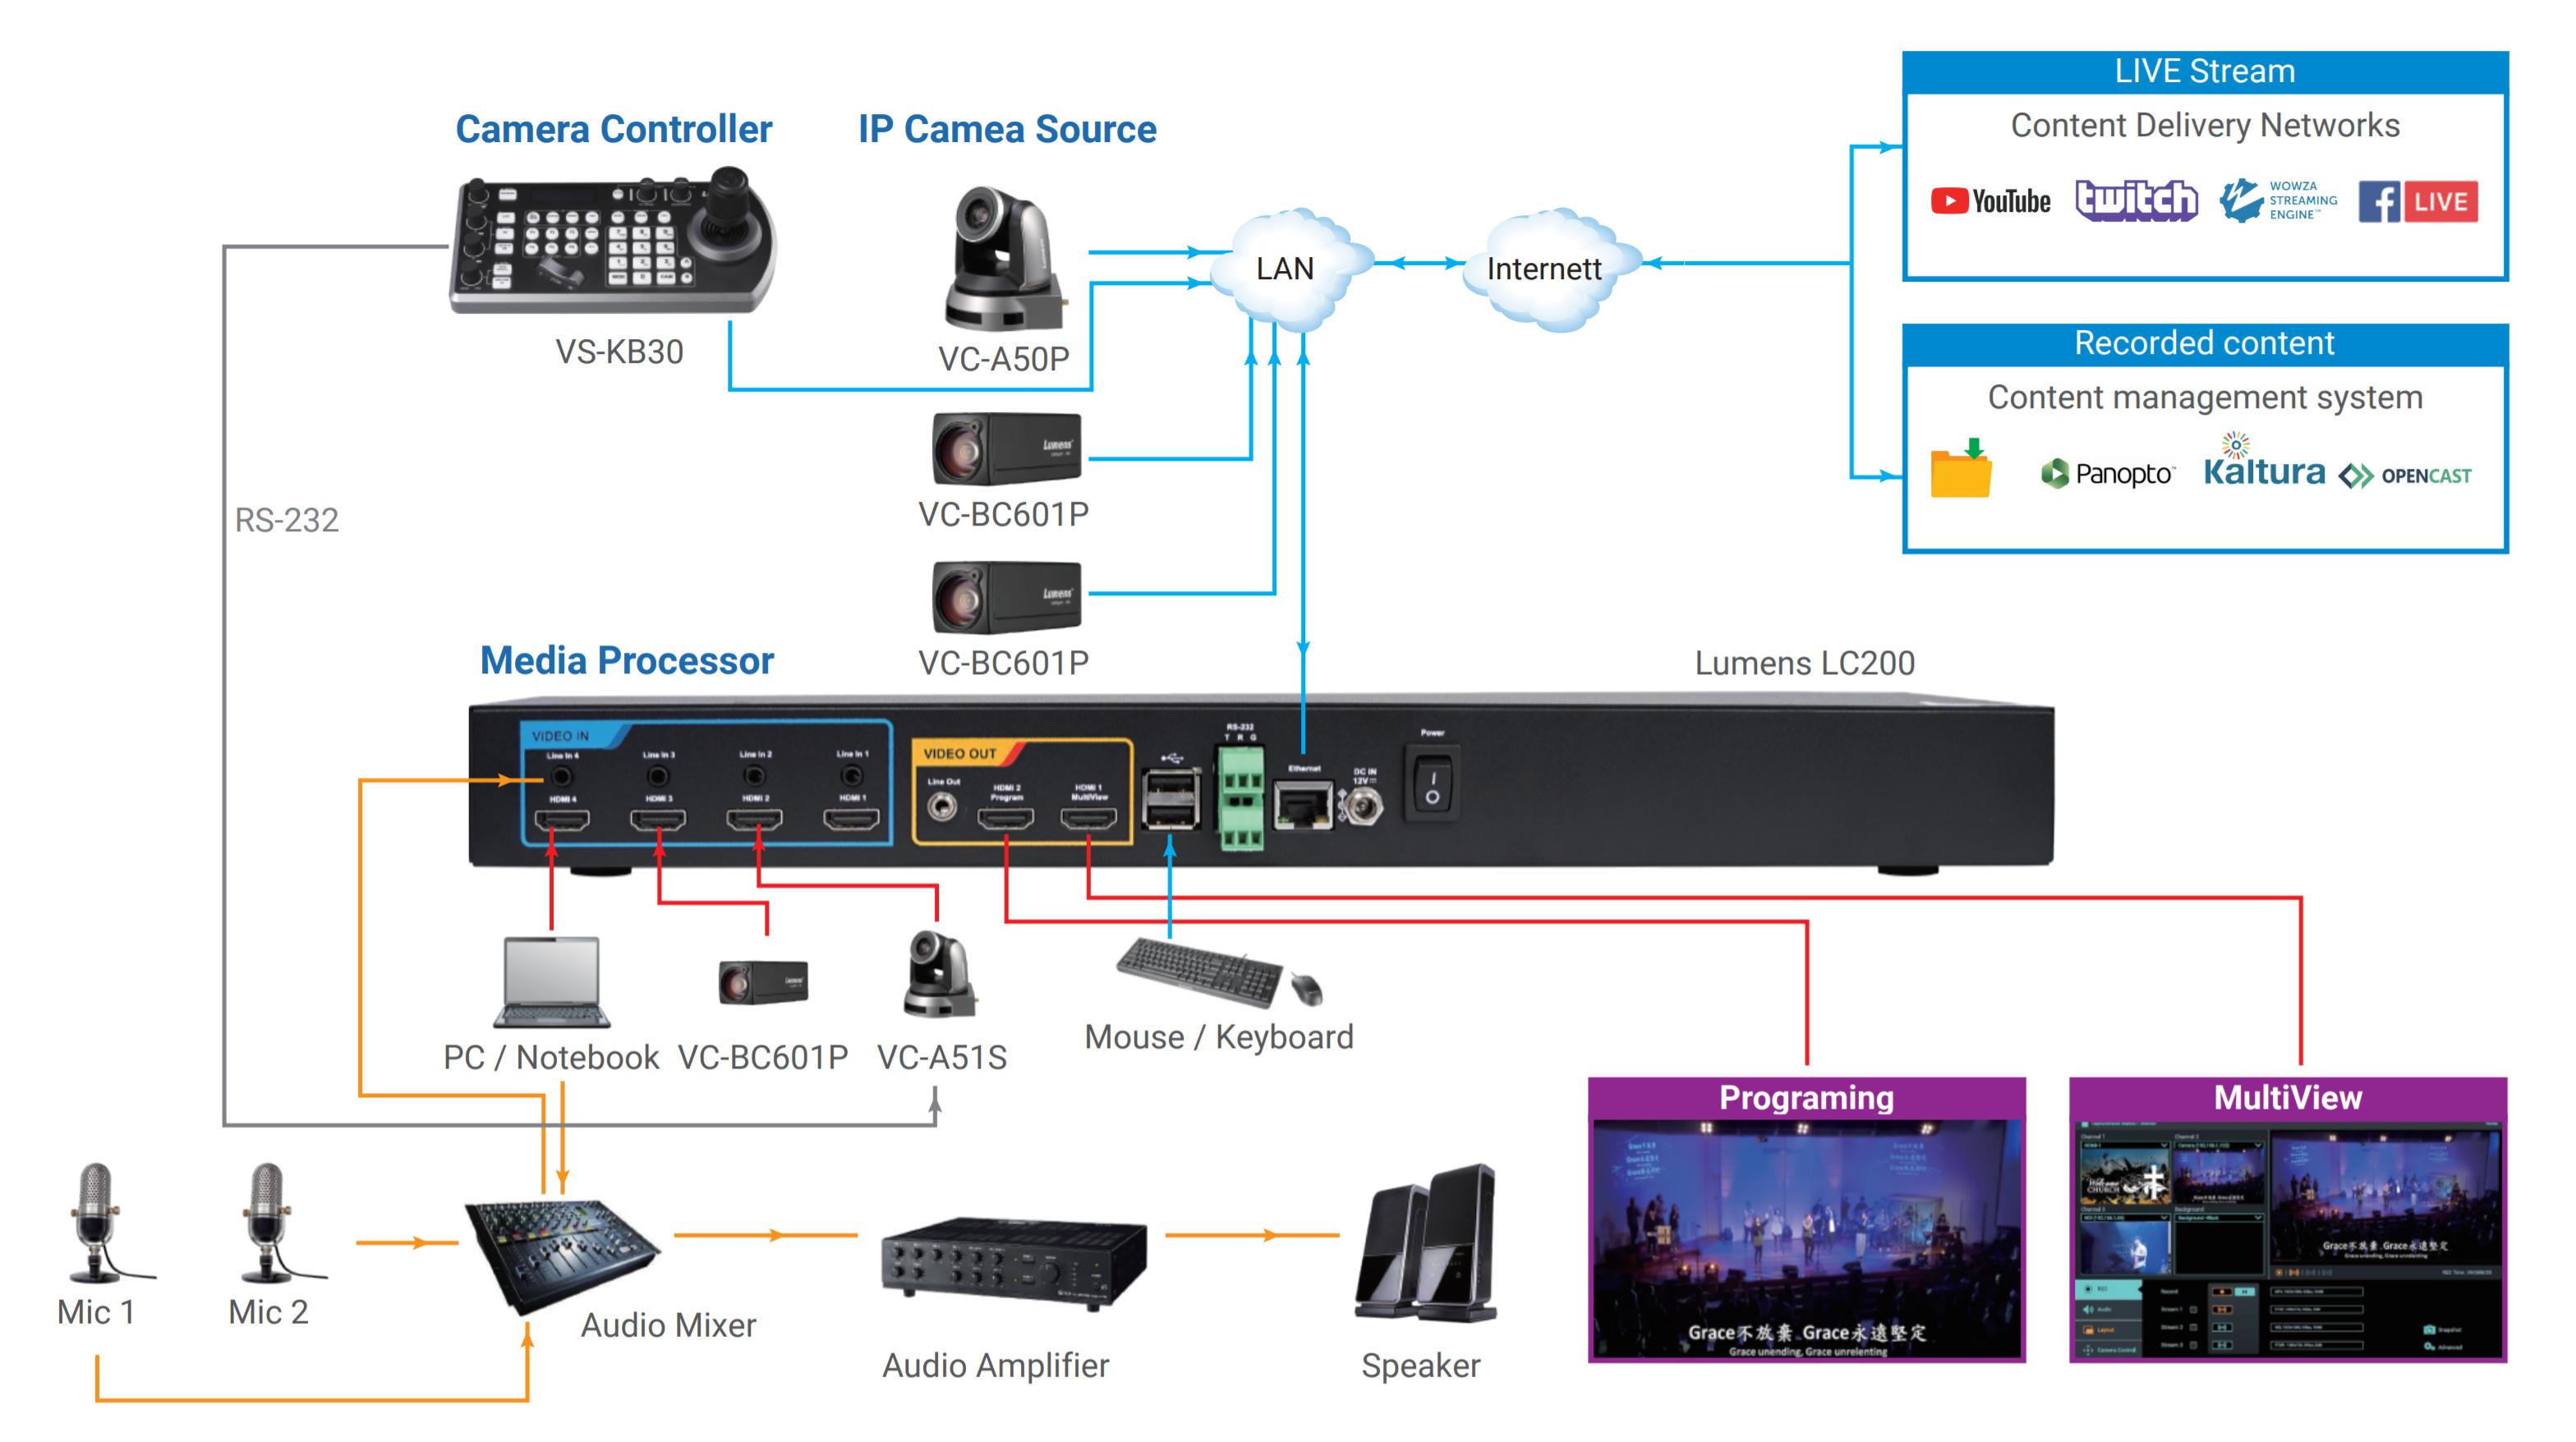 Lumens VS-LC200 Live Streaming Diagram Example